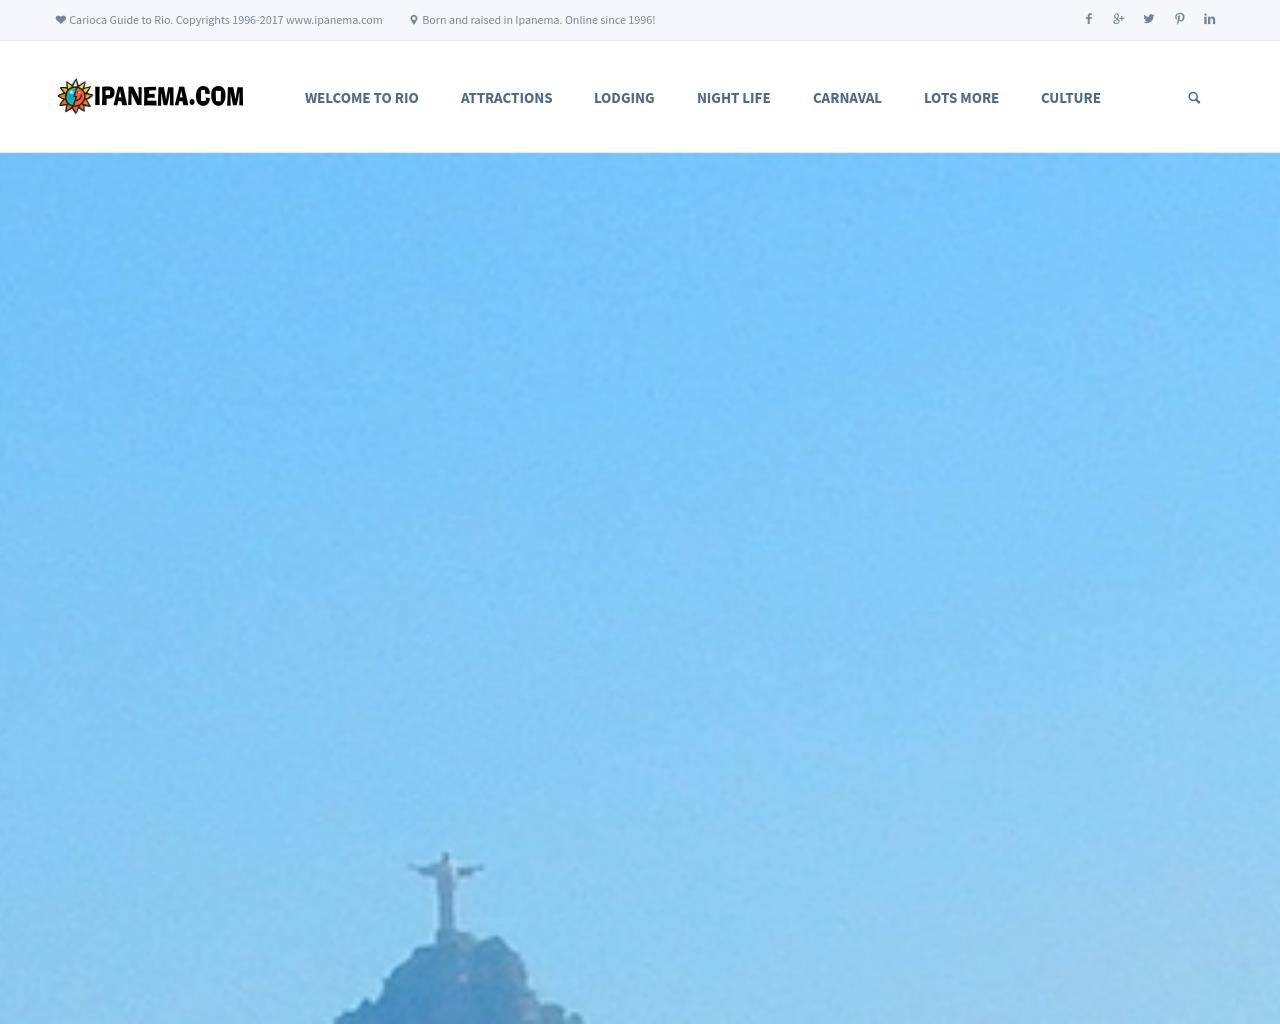 Ipacom-Travel-Advertising-Reviews-Pricing